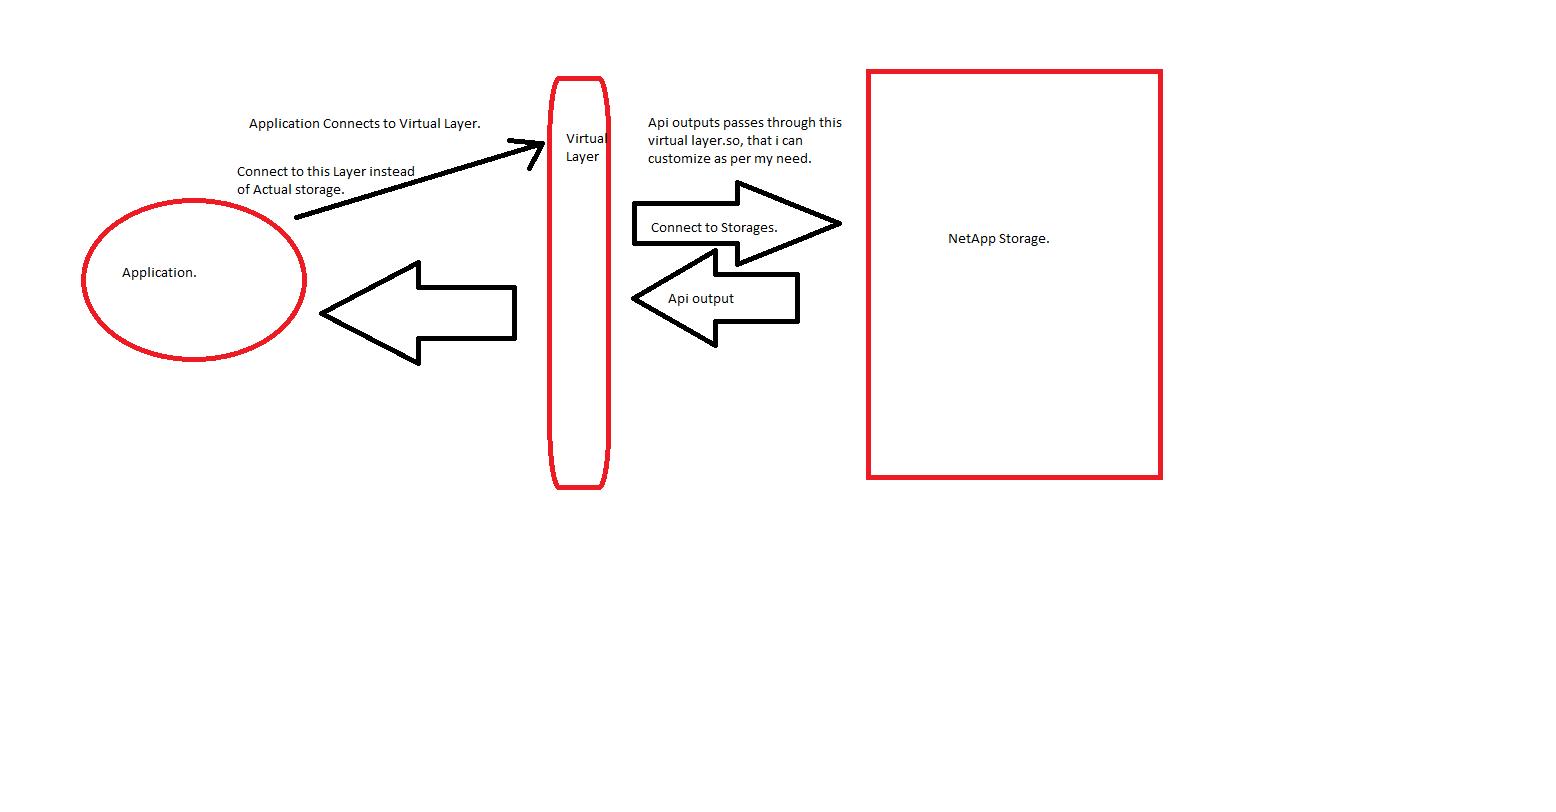 NetApp_Customized_Simulator.png